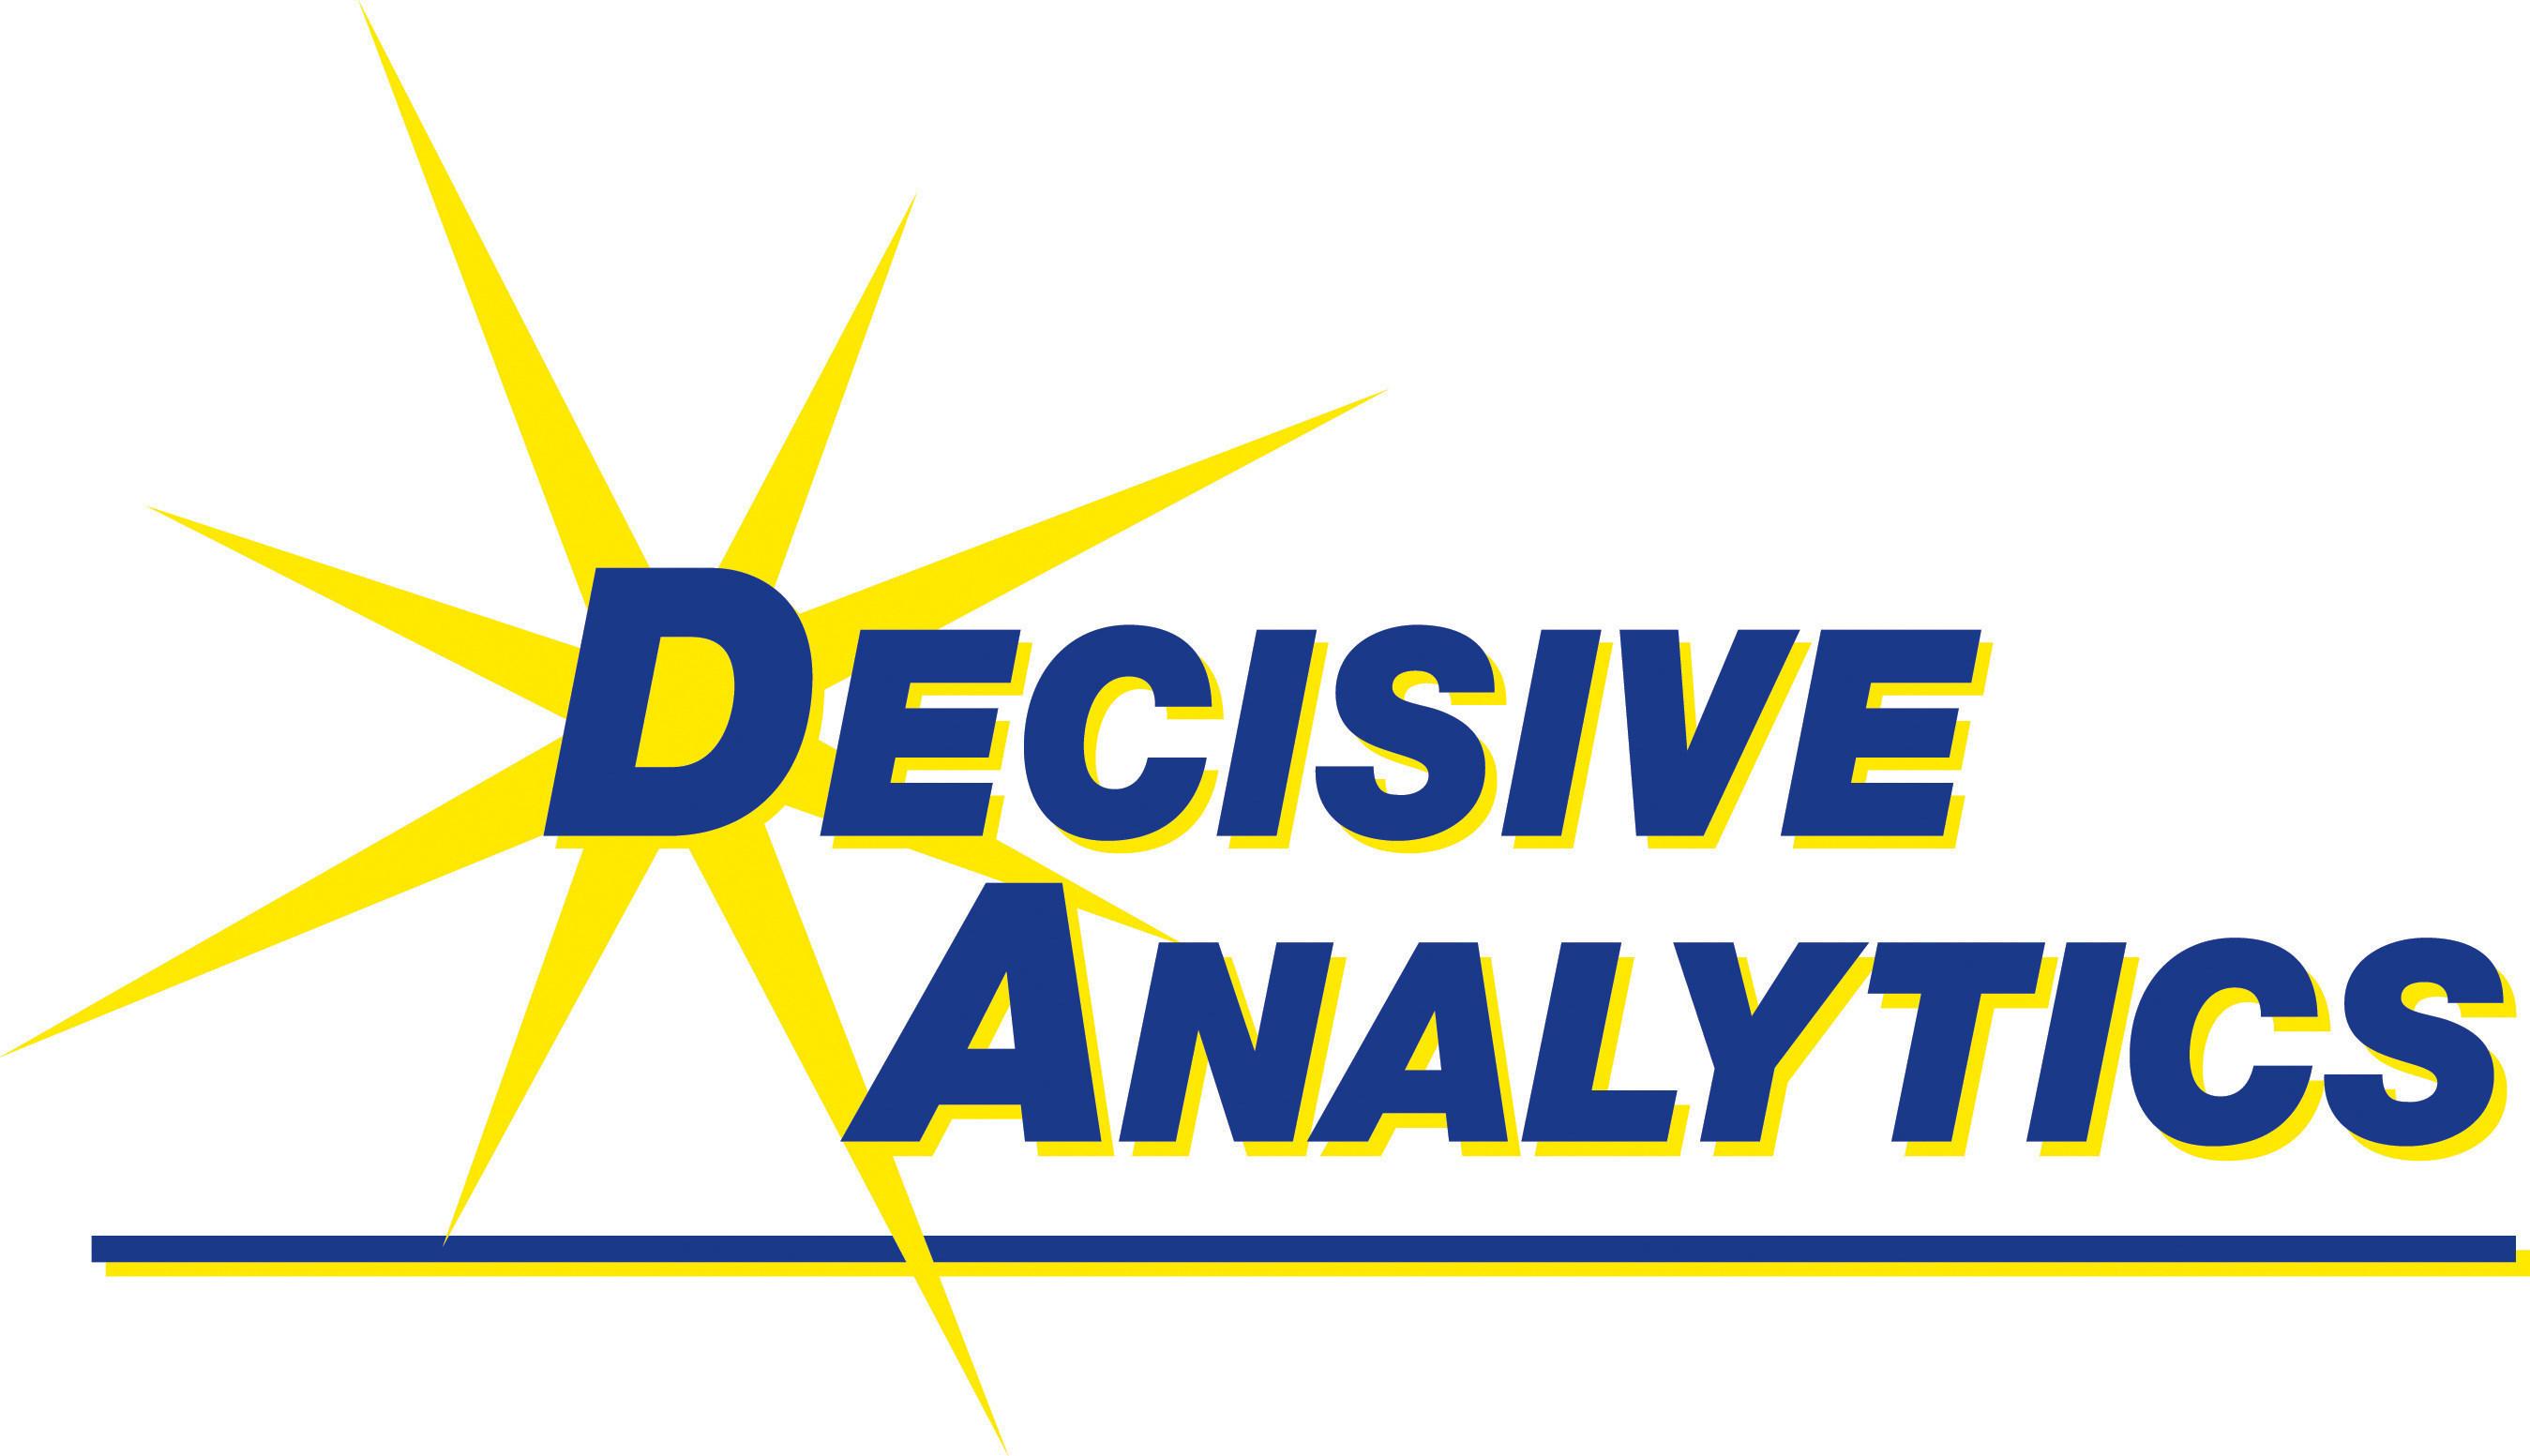 DECISIVE ANALYTICS Corporation is an employee owned company based in Arlington, VA (PRNewsFoto/DECISIVE ANALYTICS Corporation)